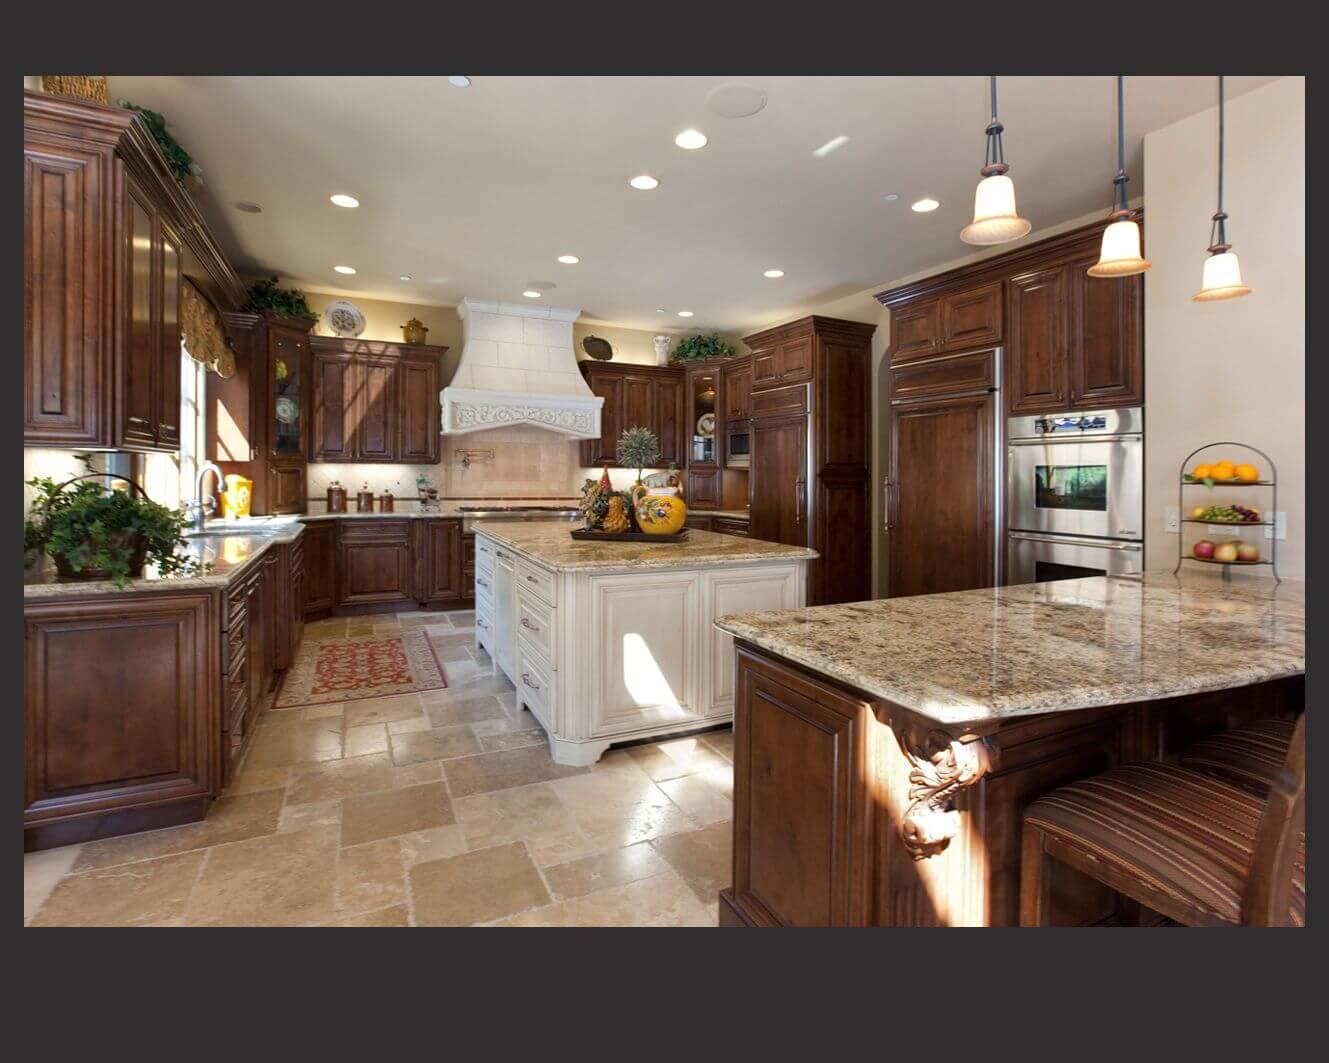 dark kitchen cabinets brown kitchen cabinets Richly detailed U shaped kitchen centers dark wood cabinetry around large white painted wood